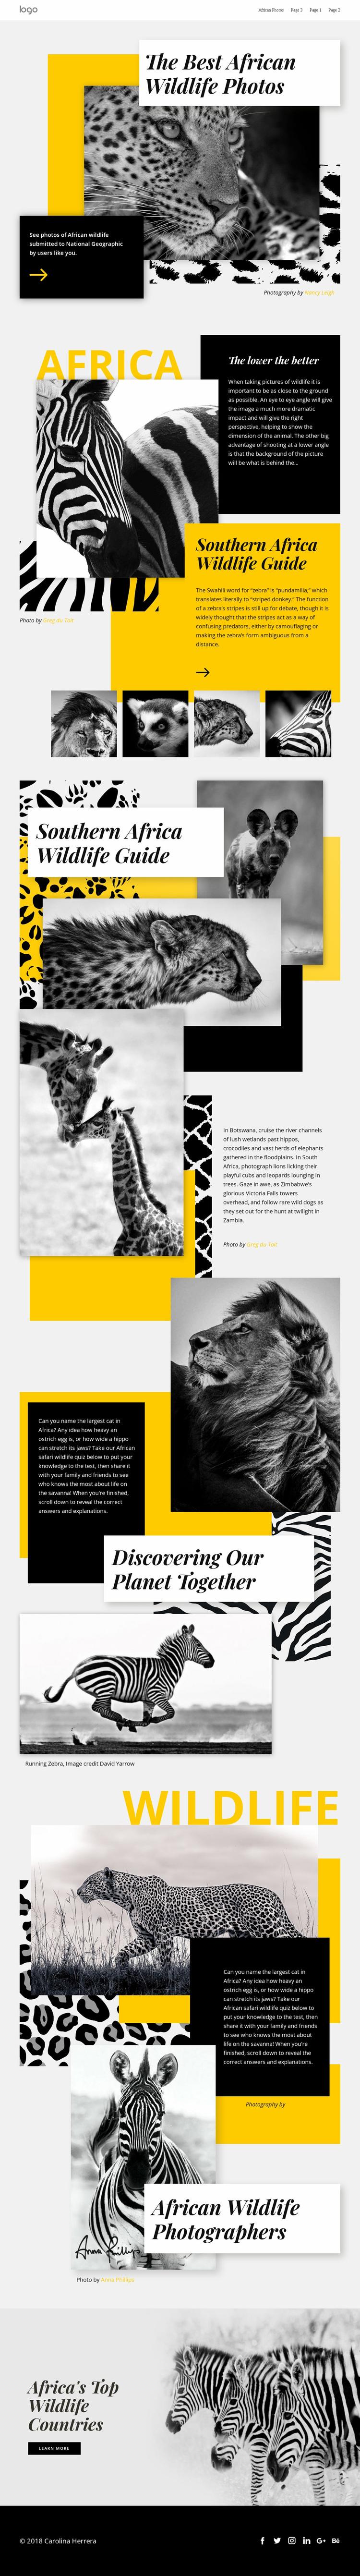 Best African Photos Website Design